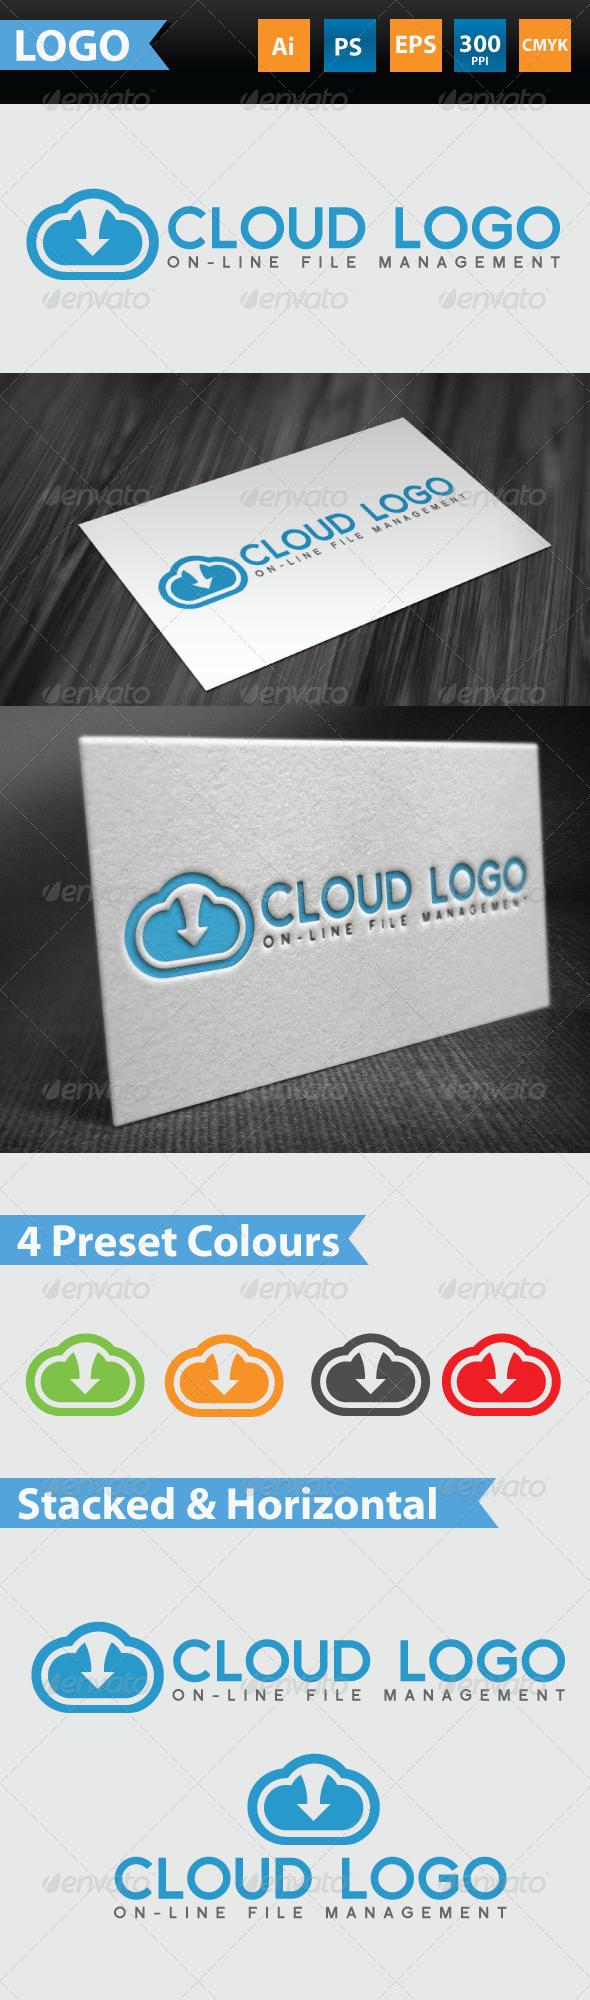 GraphicRiver Cloud logo on-line file management 3462201